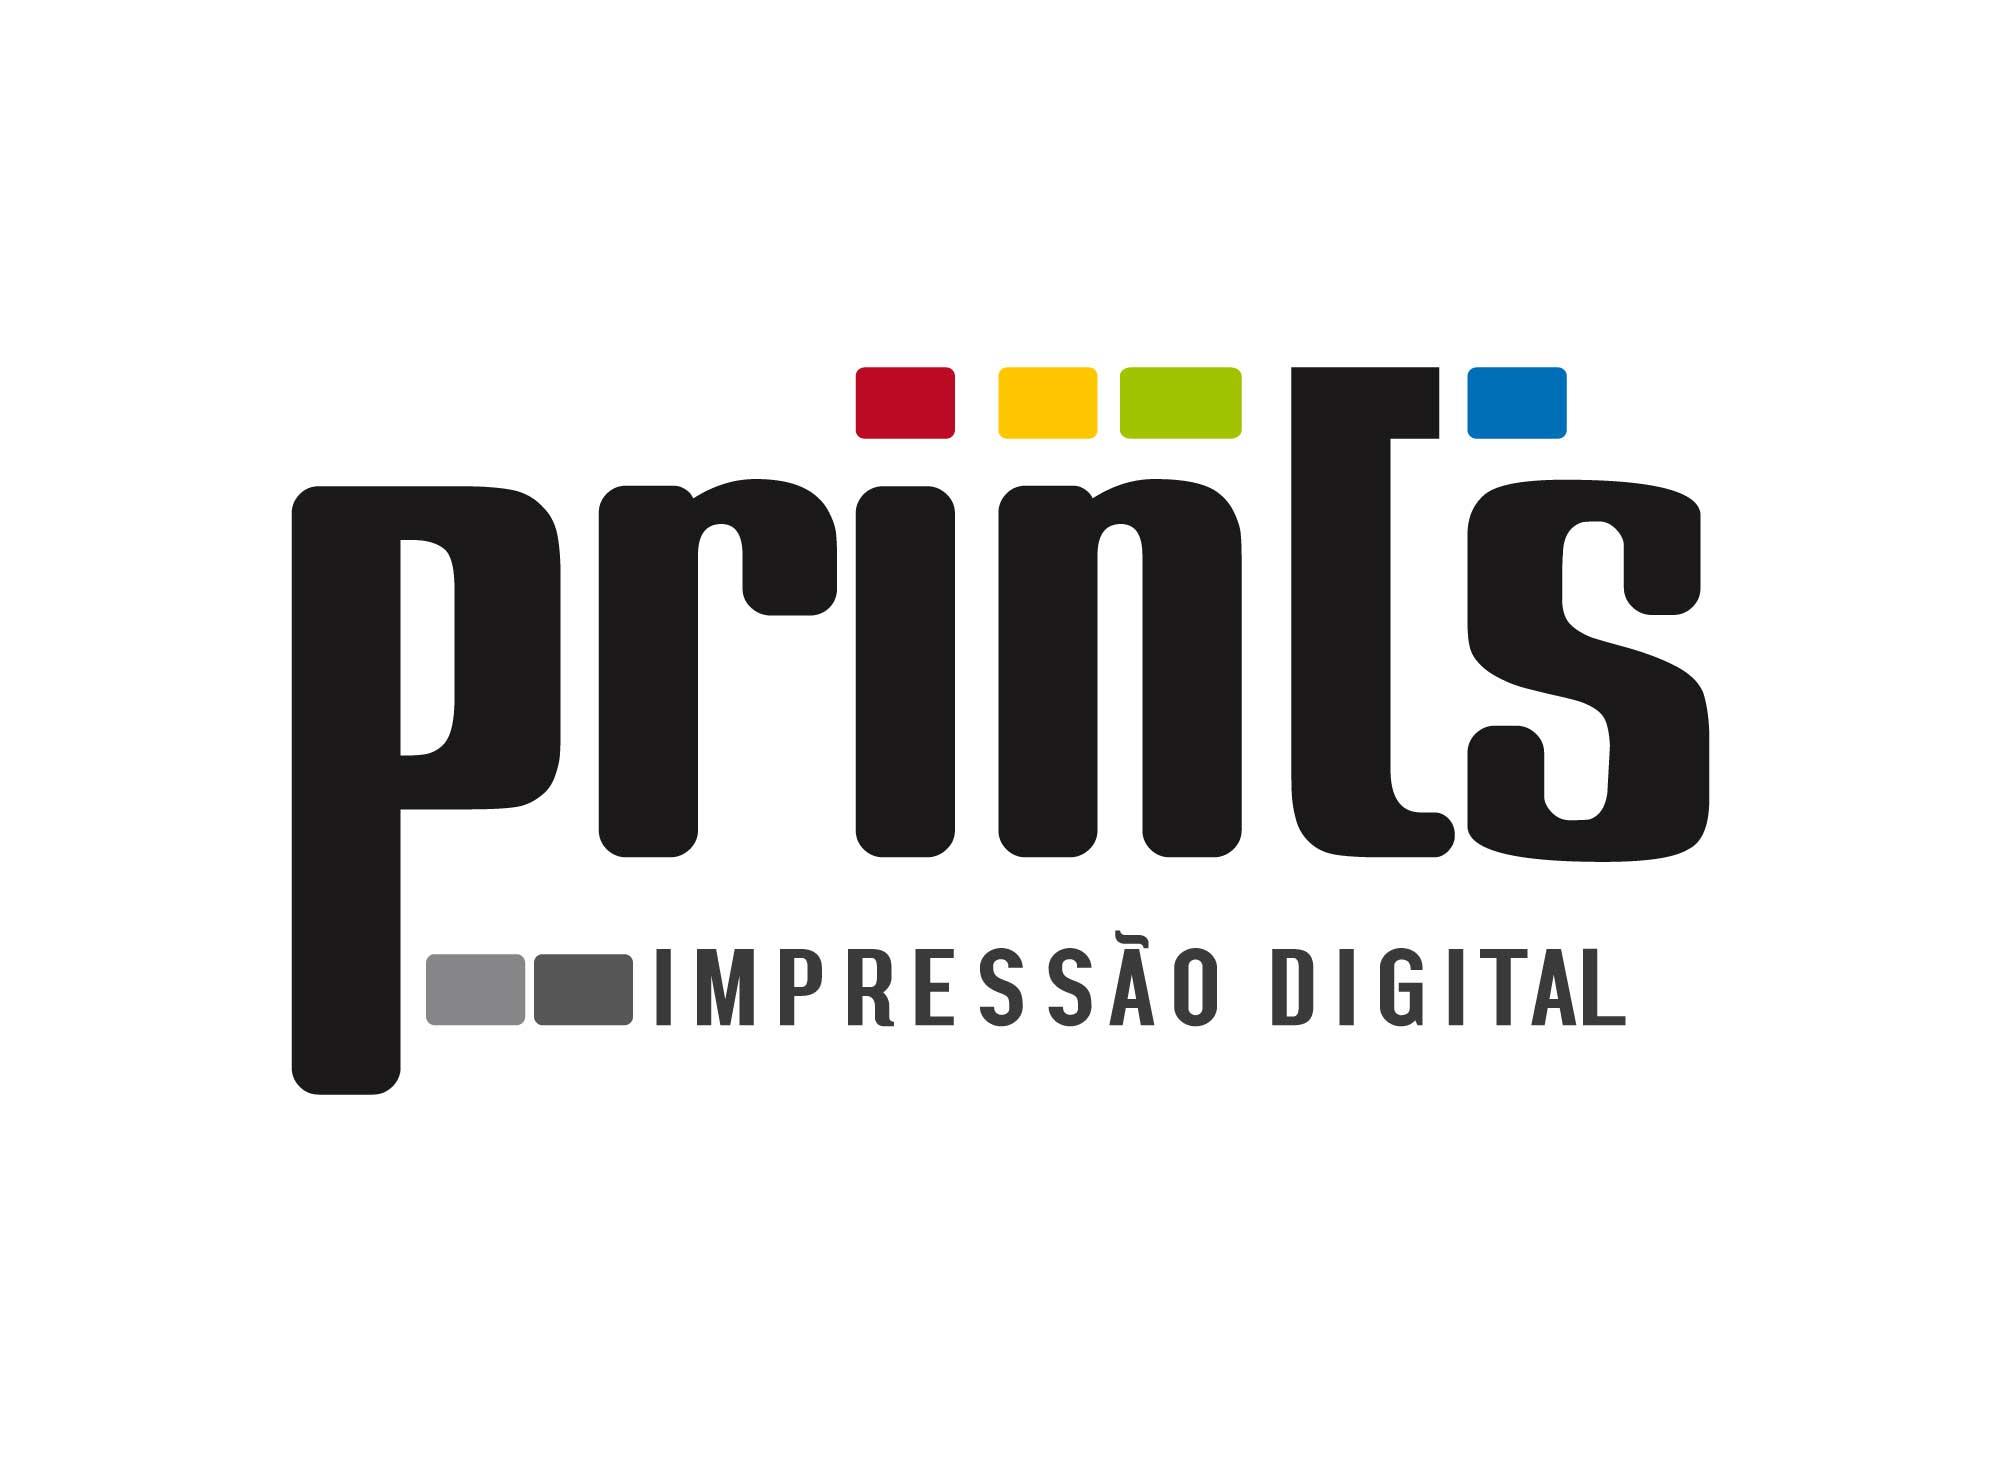 grafica-prints-impressao-digital-cliente-agencia-diretriz-digital-marketing-fortaleza